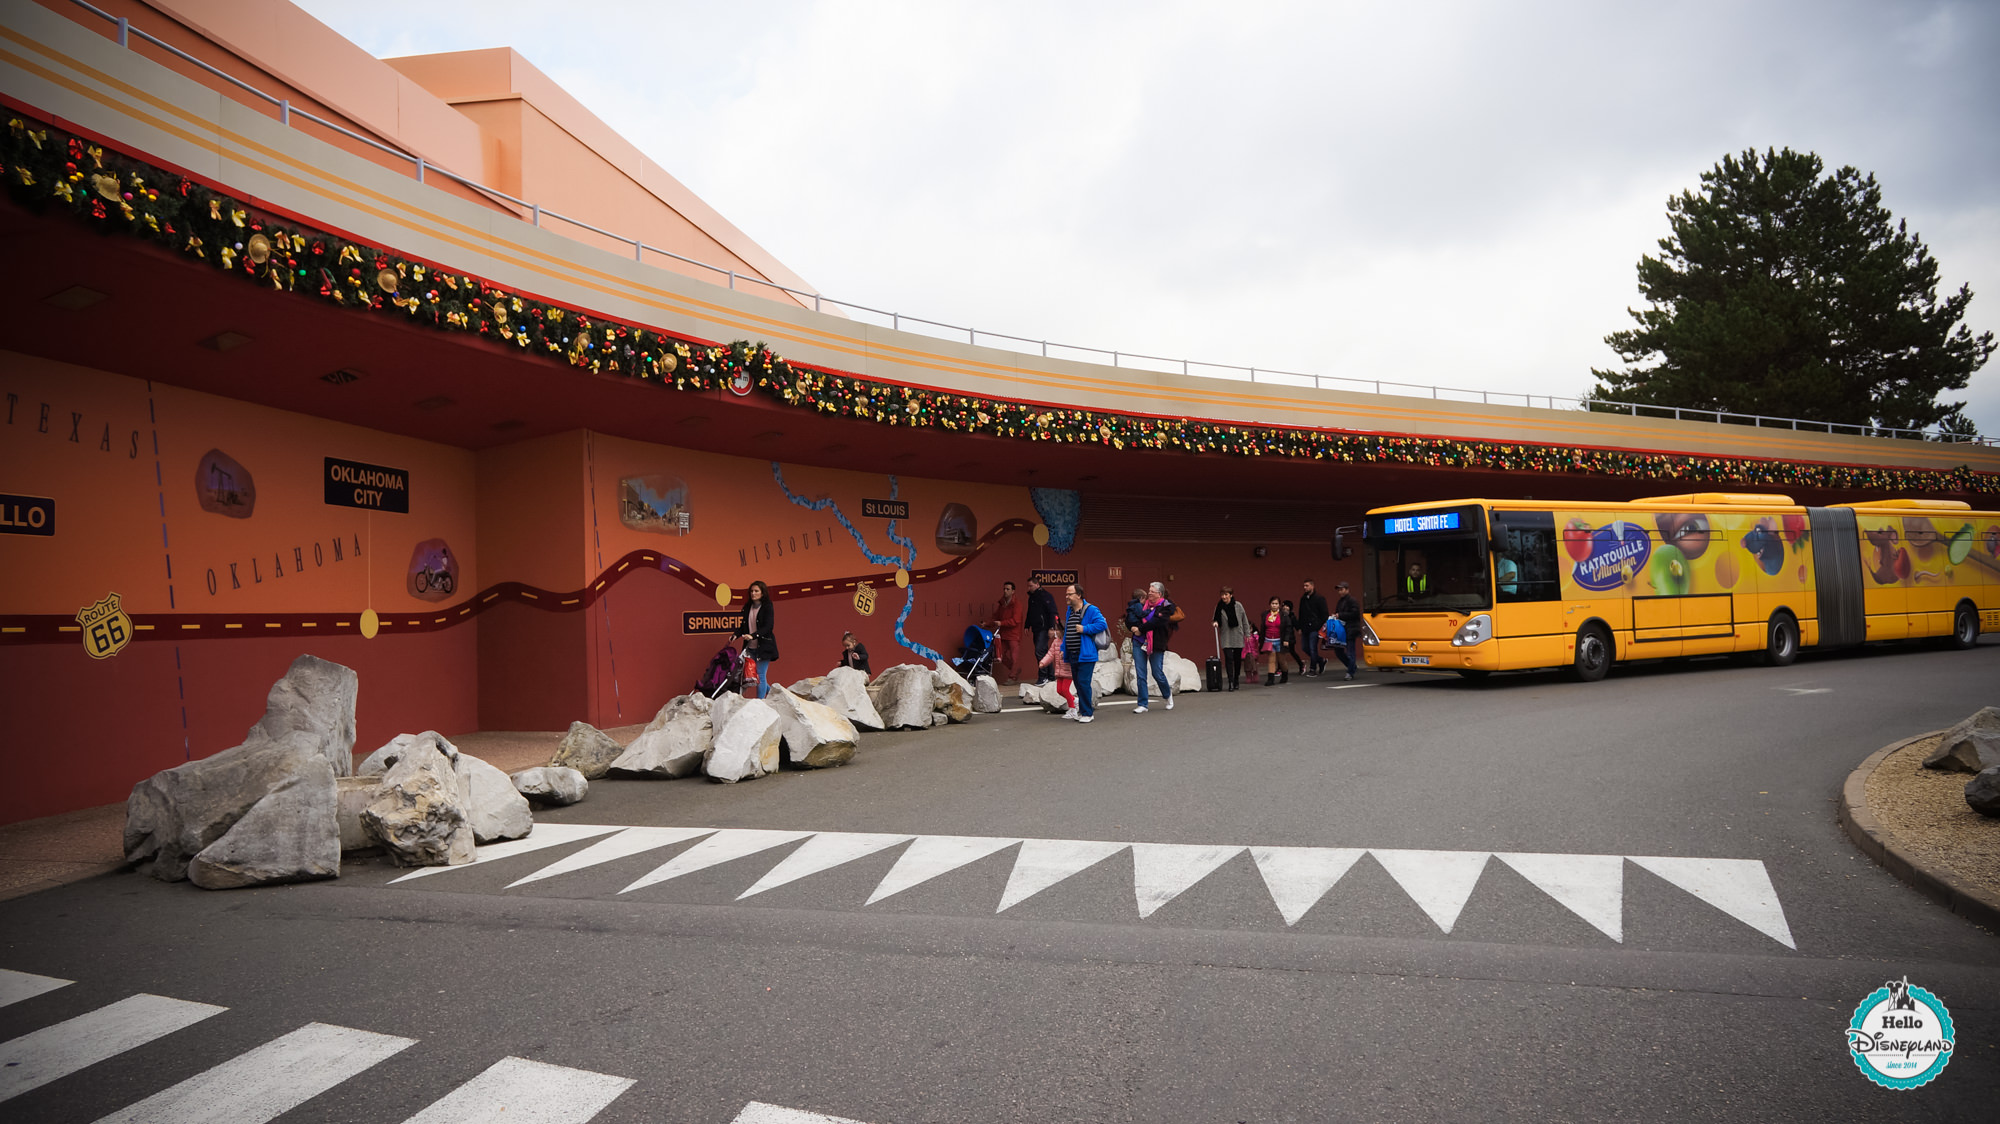 Hotel Santa Fe Disneyland Restaurant